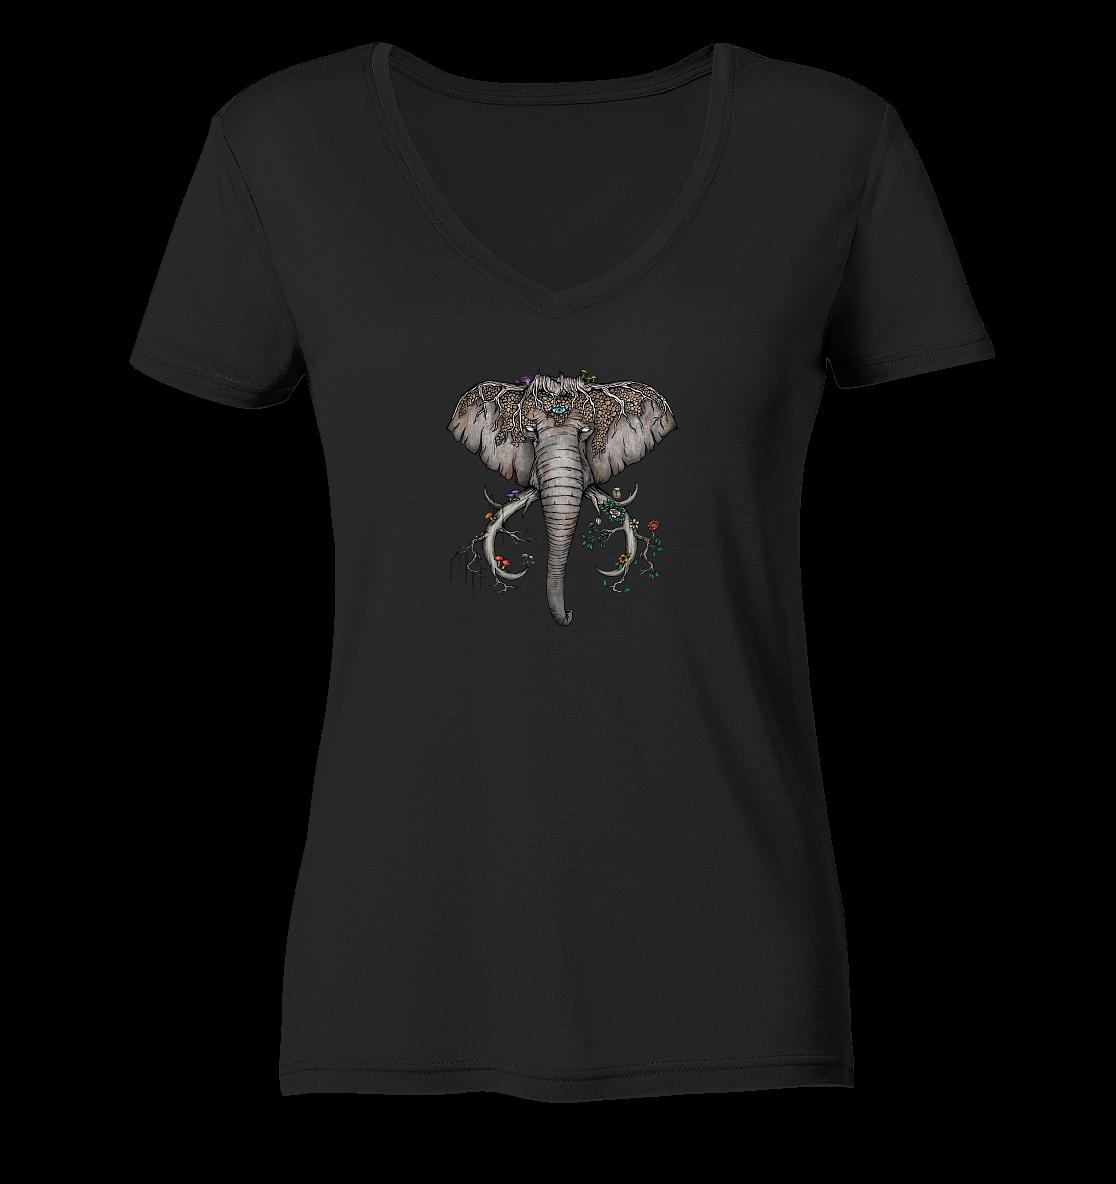 front-ladies-organic-v-neck-shirt-272727-1116x.png